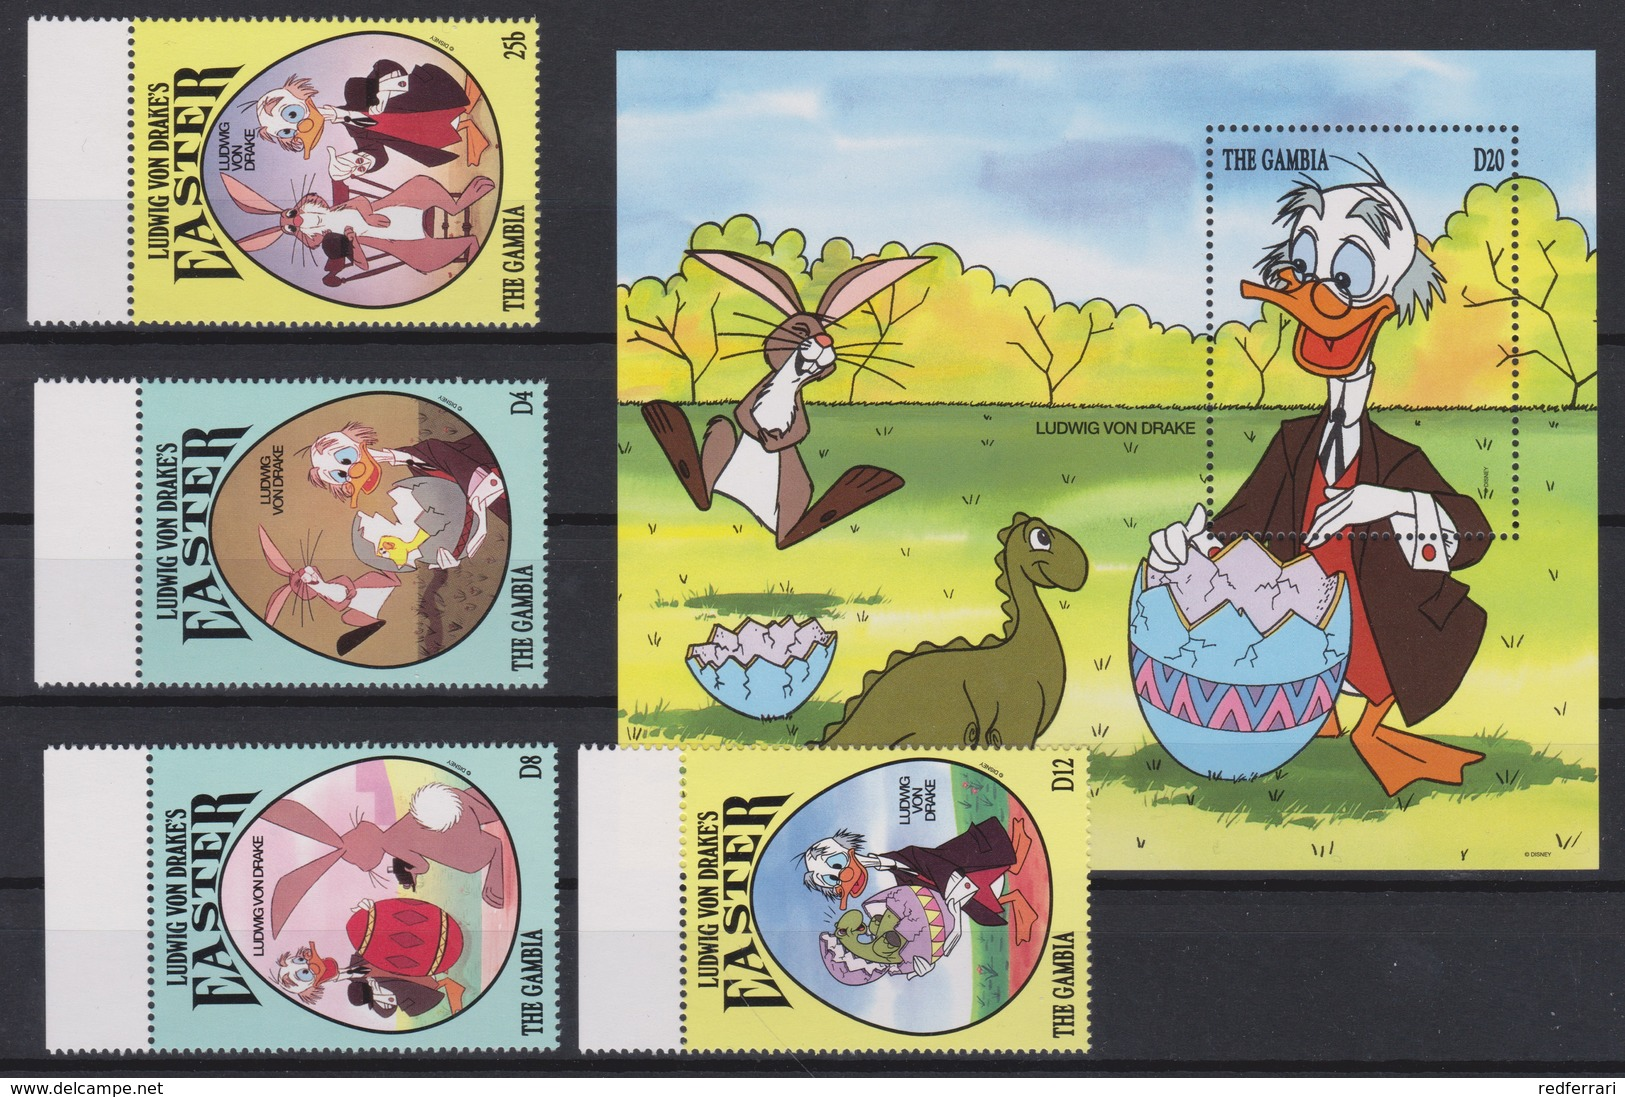 2196  WALT DISNEY   The GAMBIA  ( EASTER I ) Ludwig Von Drake's - The Zaster Of Professor Crazy Donald . - Disney